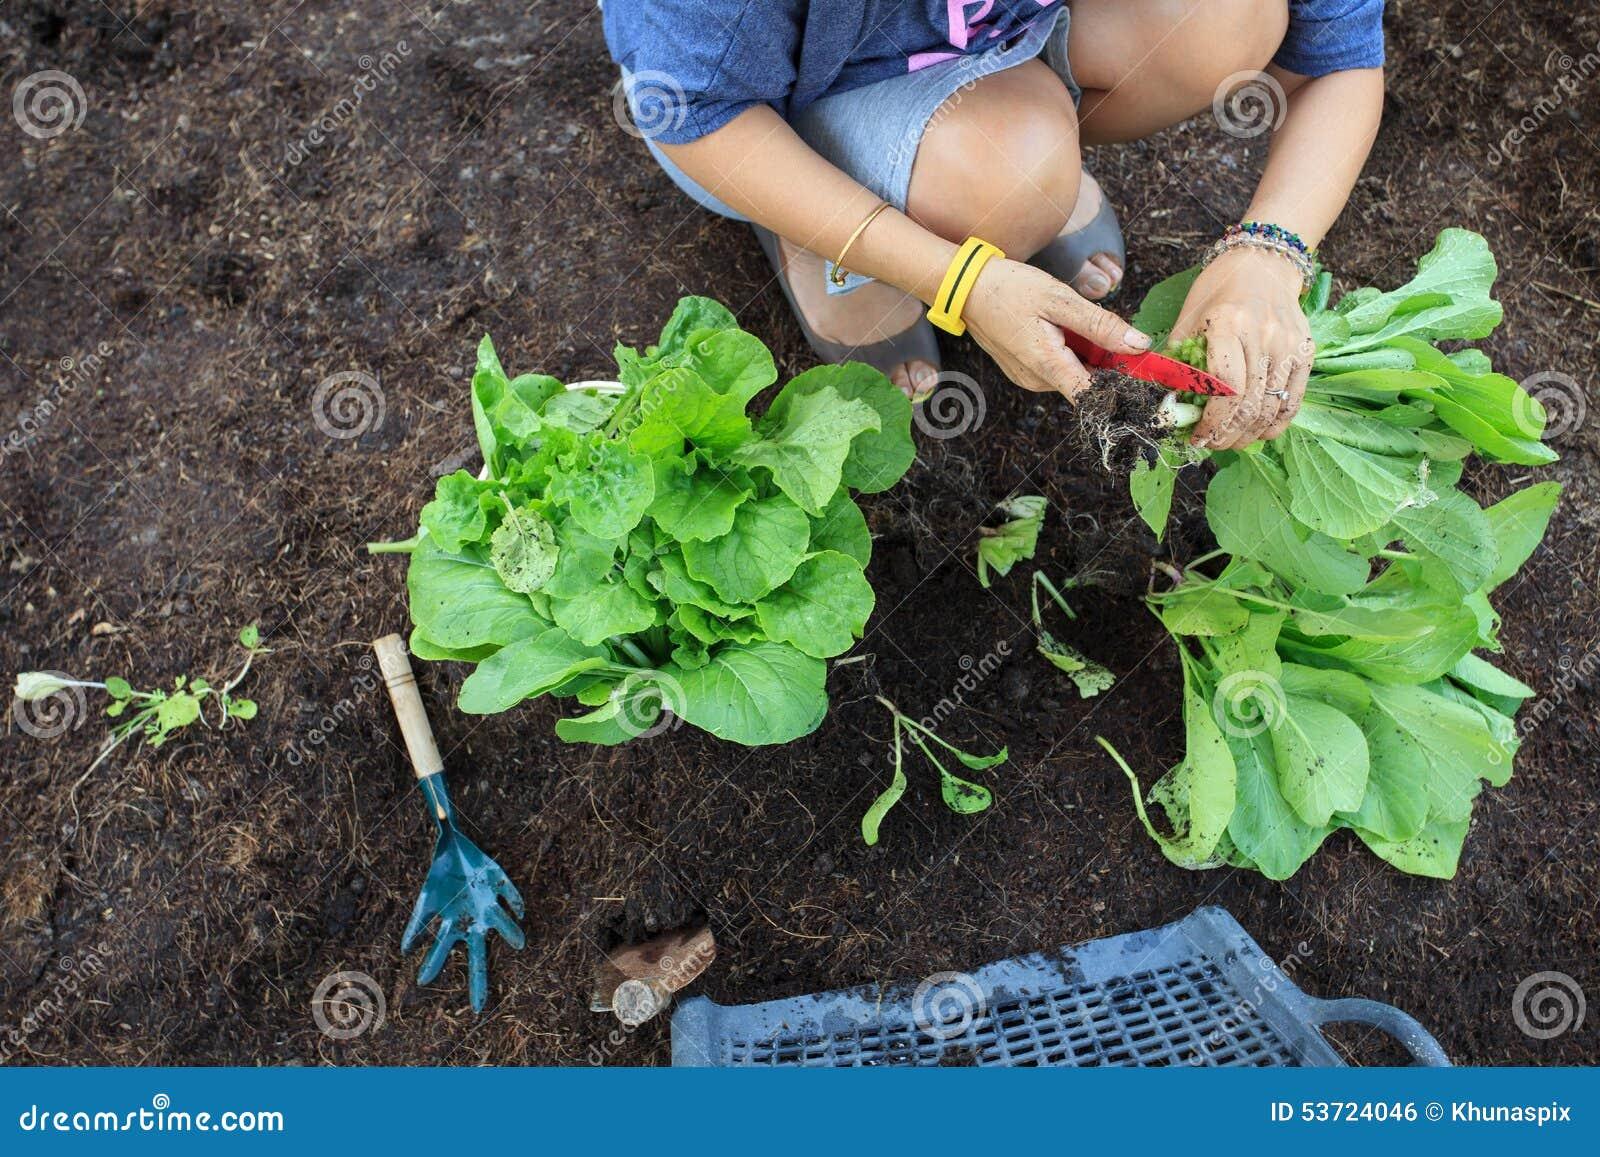 hand of people harvest clean organic vegetable in home. Black Bedroom Furniture Sets. Home Design Ideas